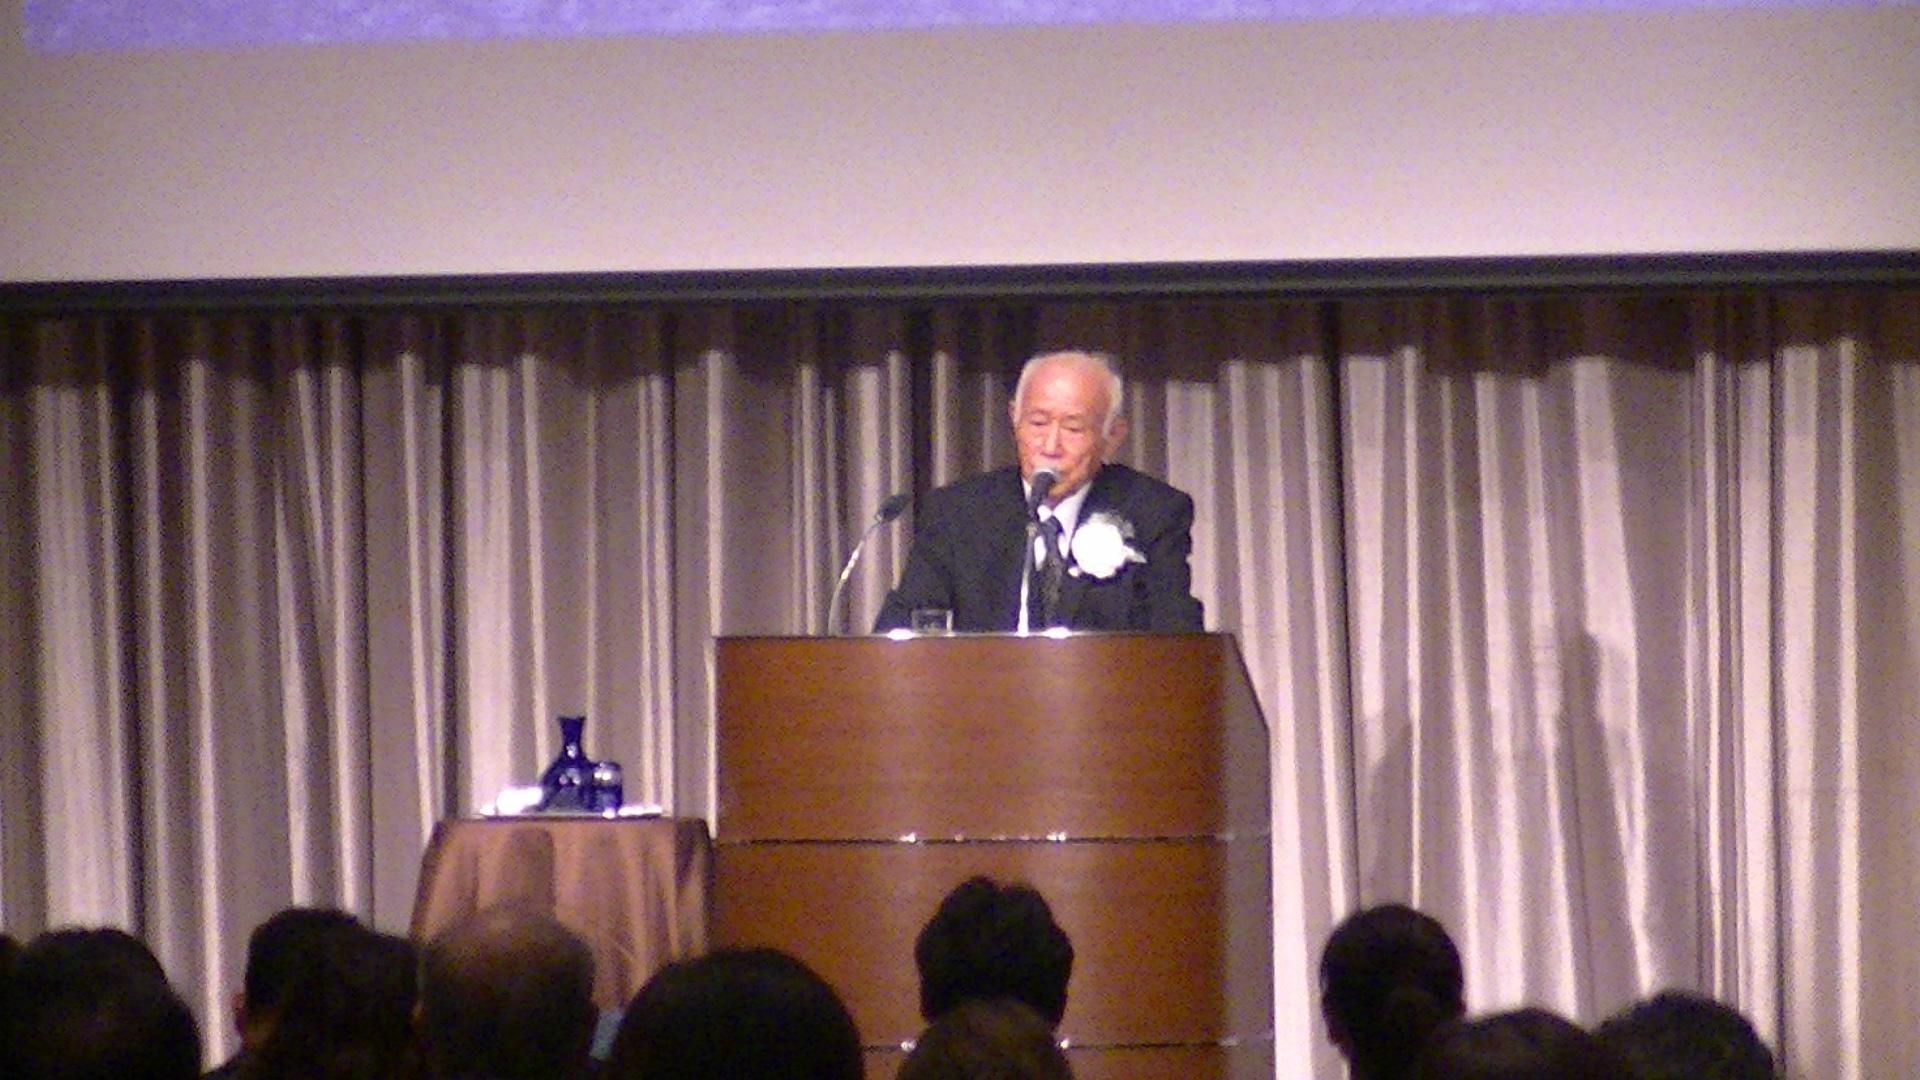 PIC 1735 - 2018年12月1日(土)第6回東京思風塾開催します。